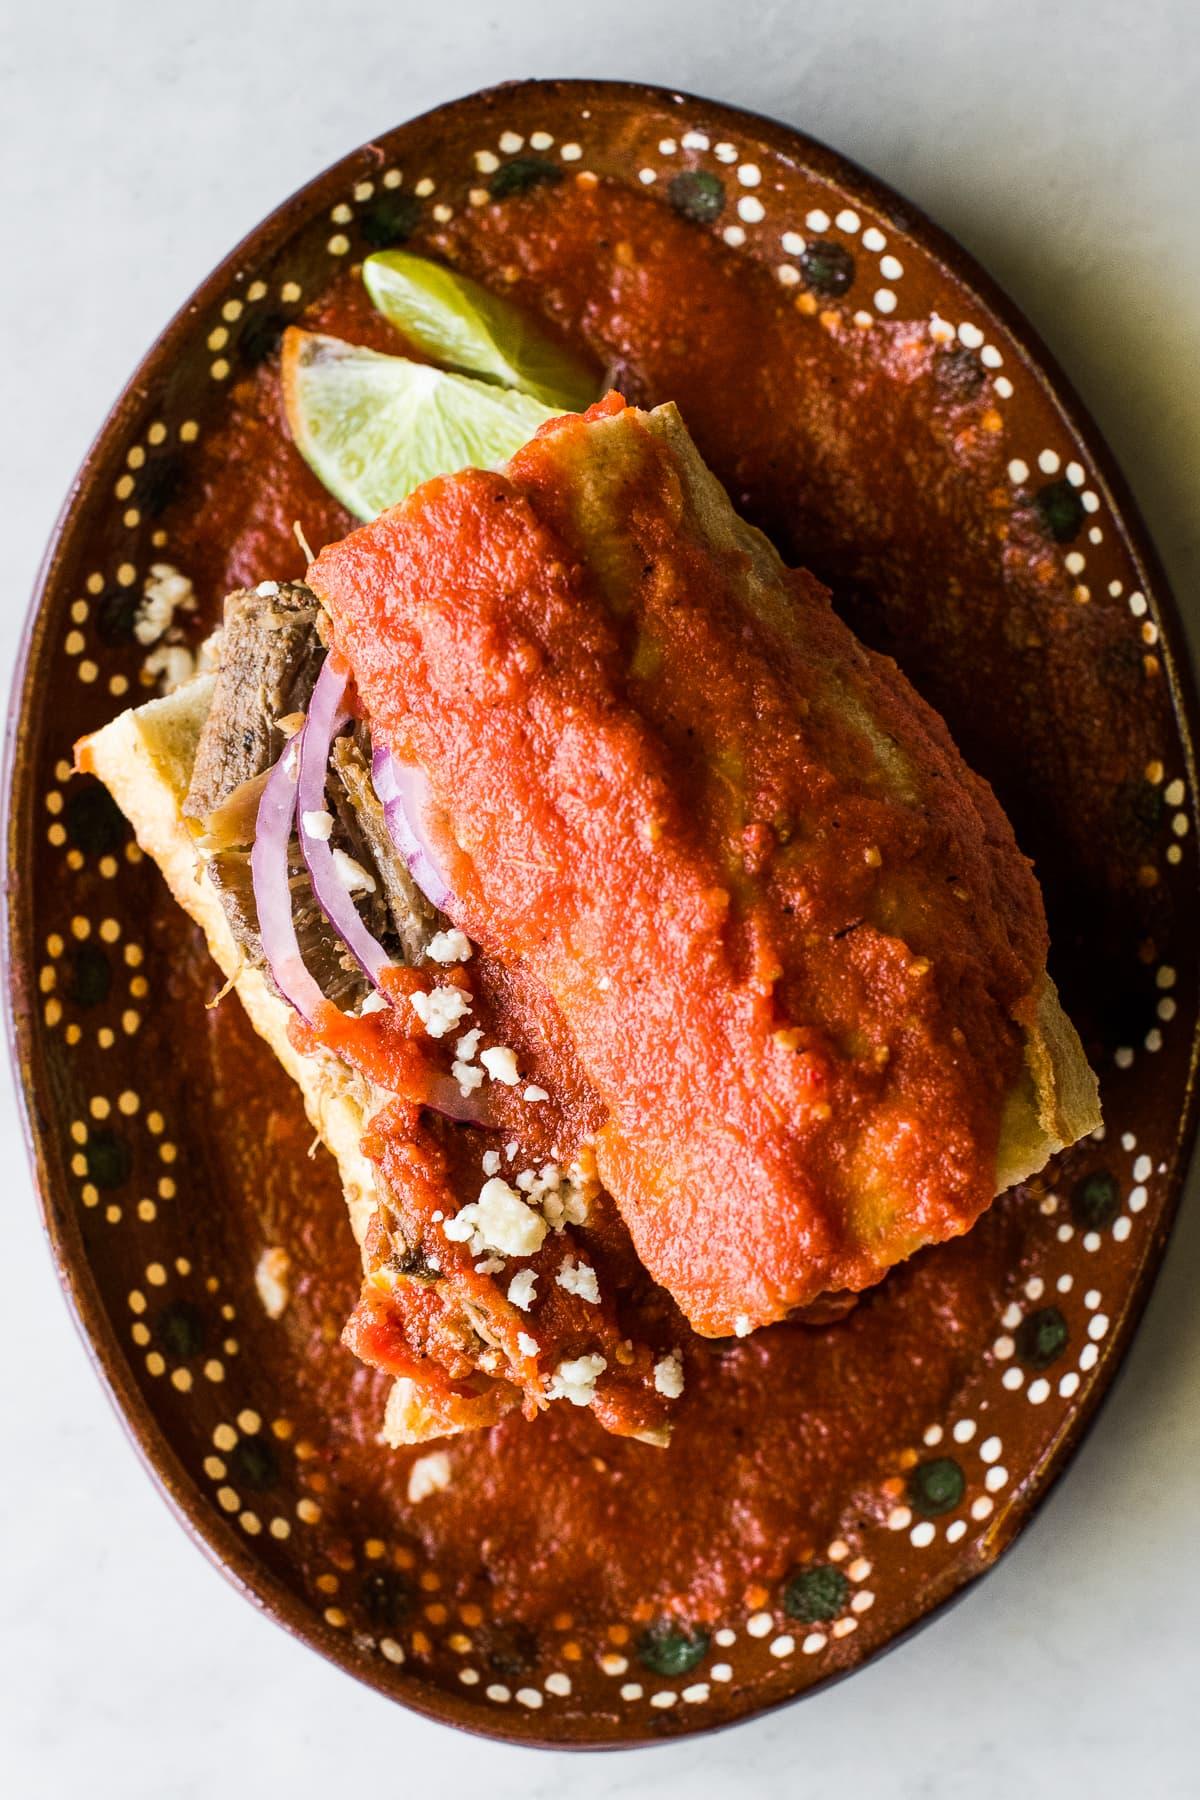 A torta ahogada Mexican sandwich on a traditional clay plate.